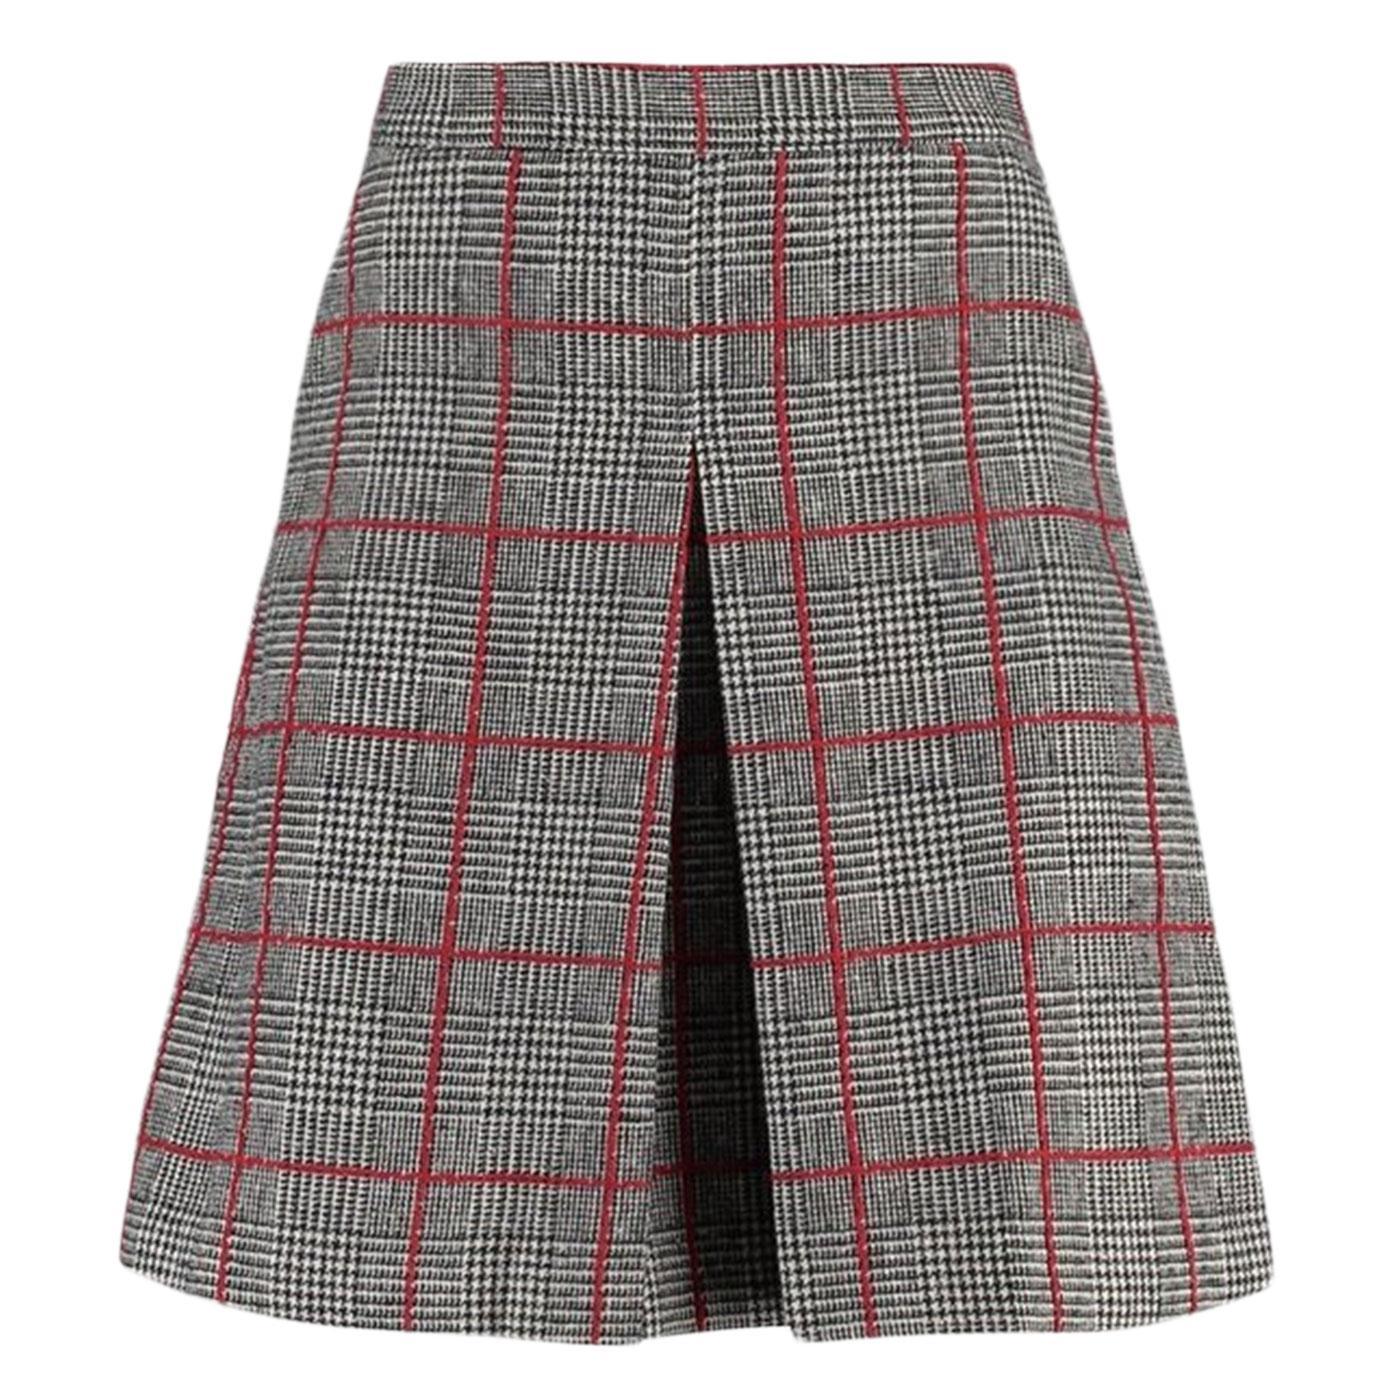 Lamont LOUCHE LONDON 60s Mod POW Check Pleat Skirt